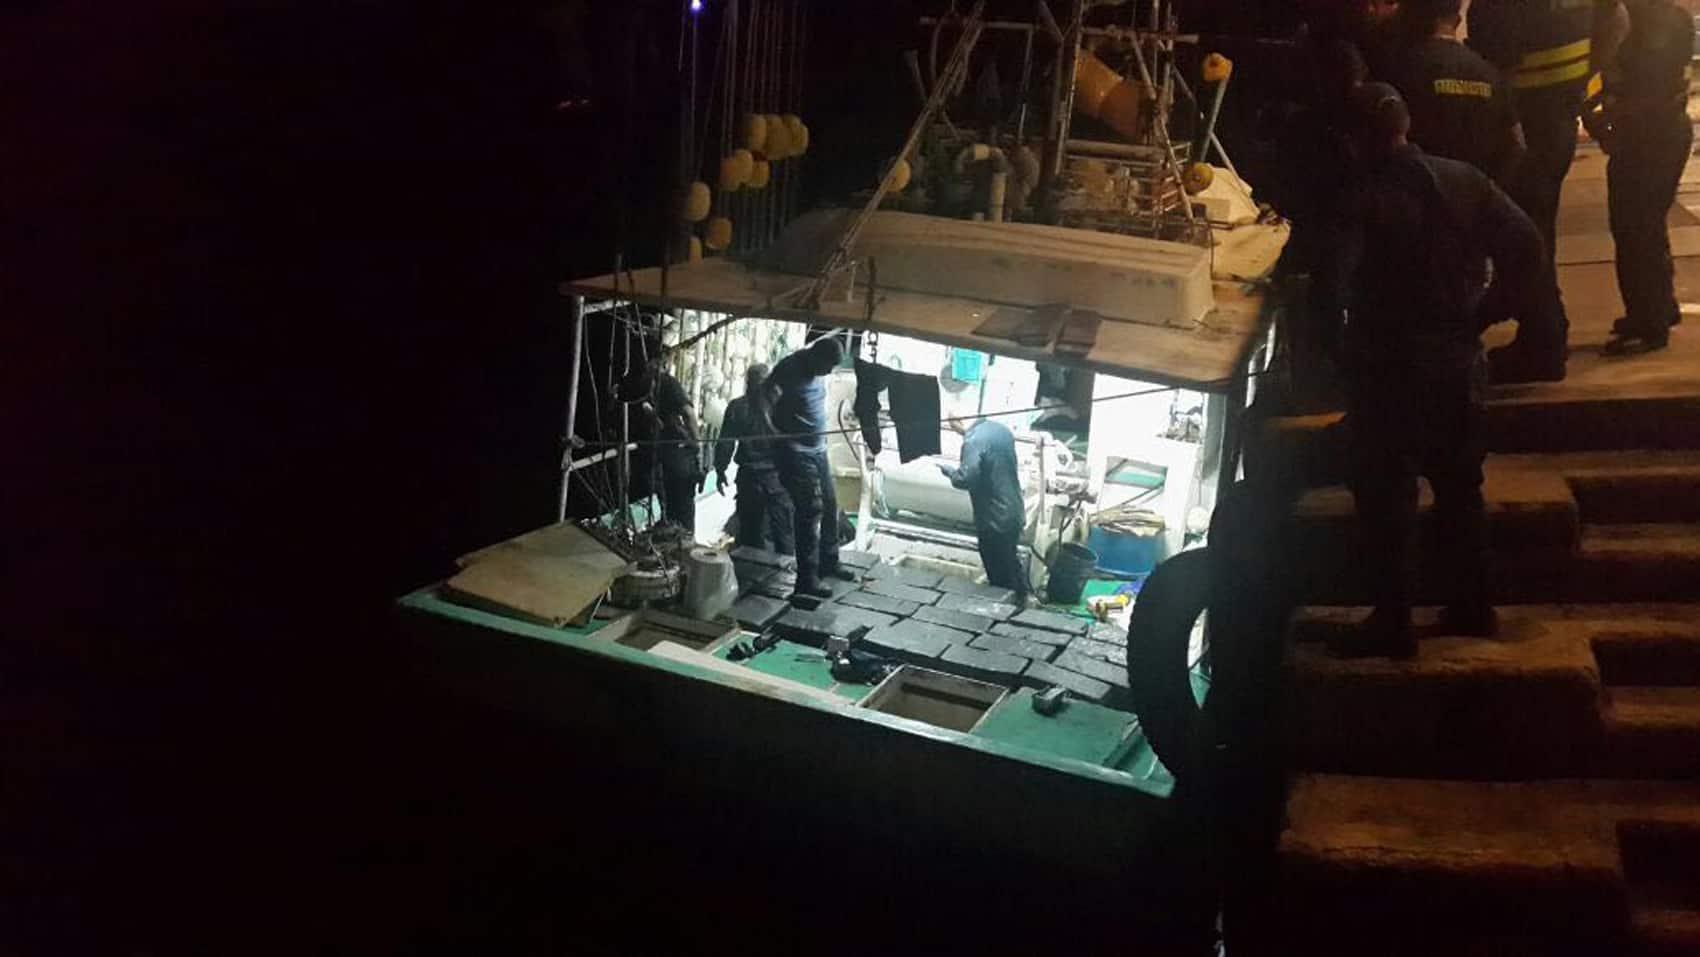 Cabo Blanco cocaine